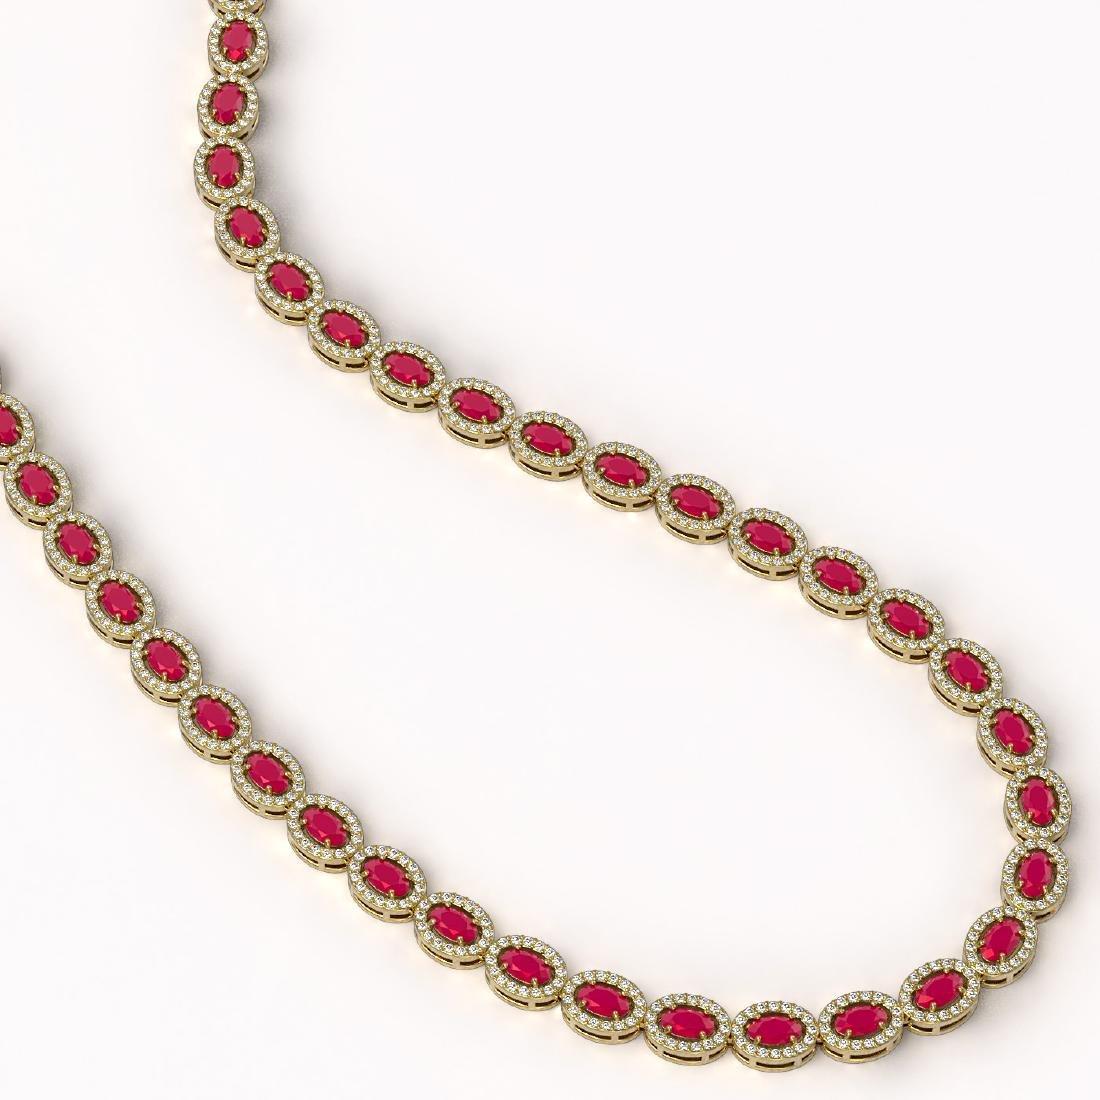 26.38 CTW Ruby & Diamond Halo Necklace 10K Yellow Gold - 2